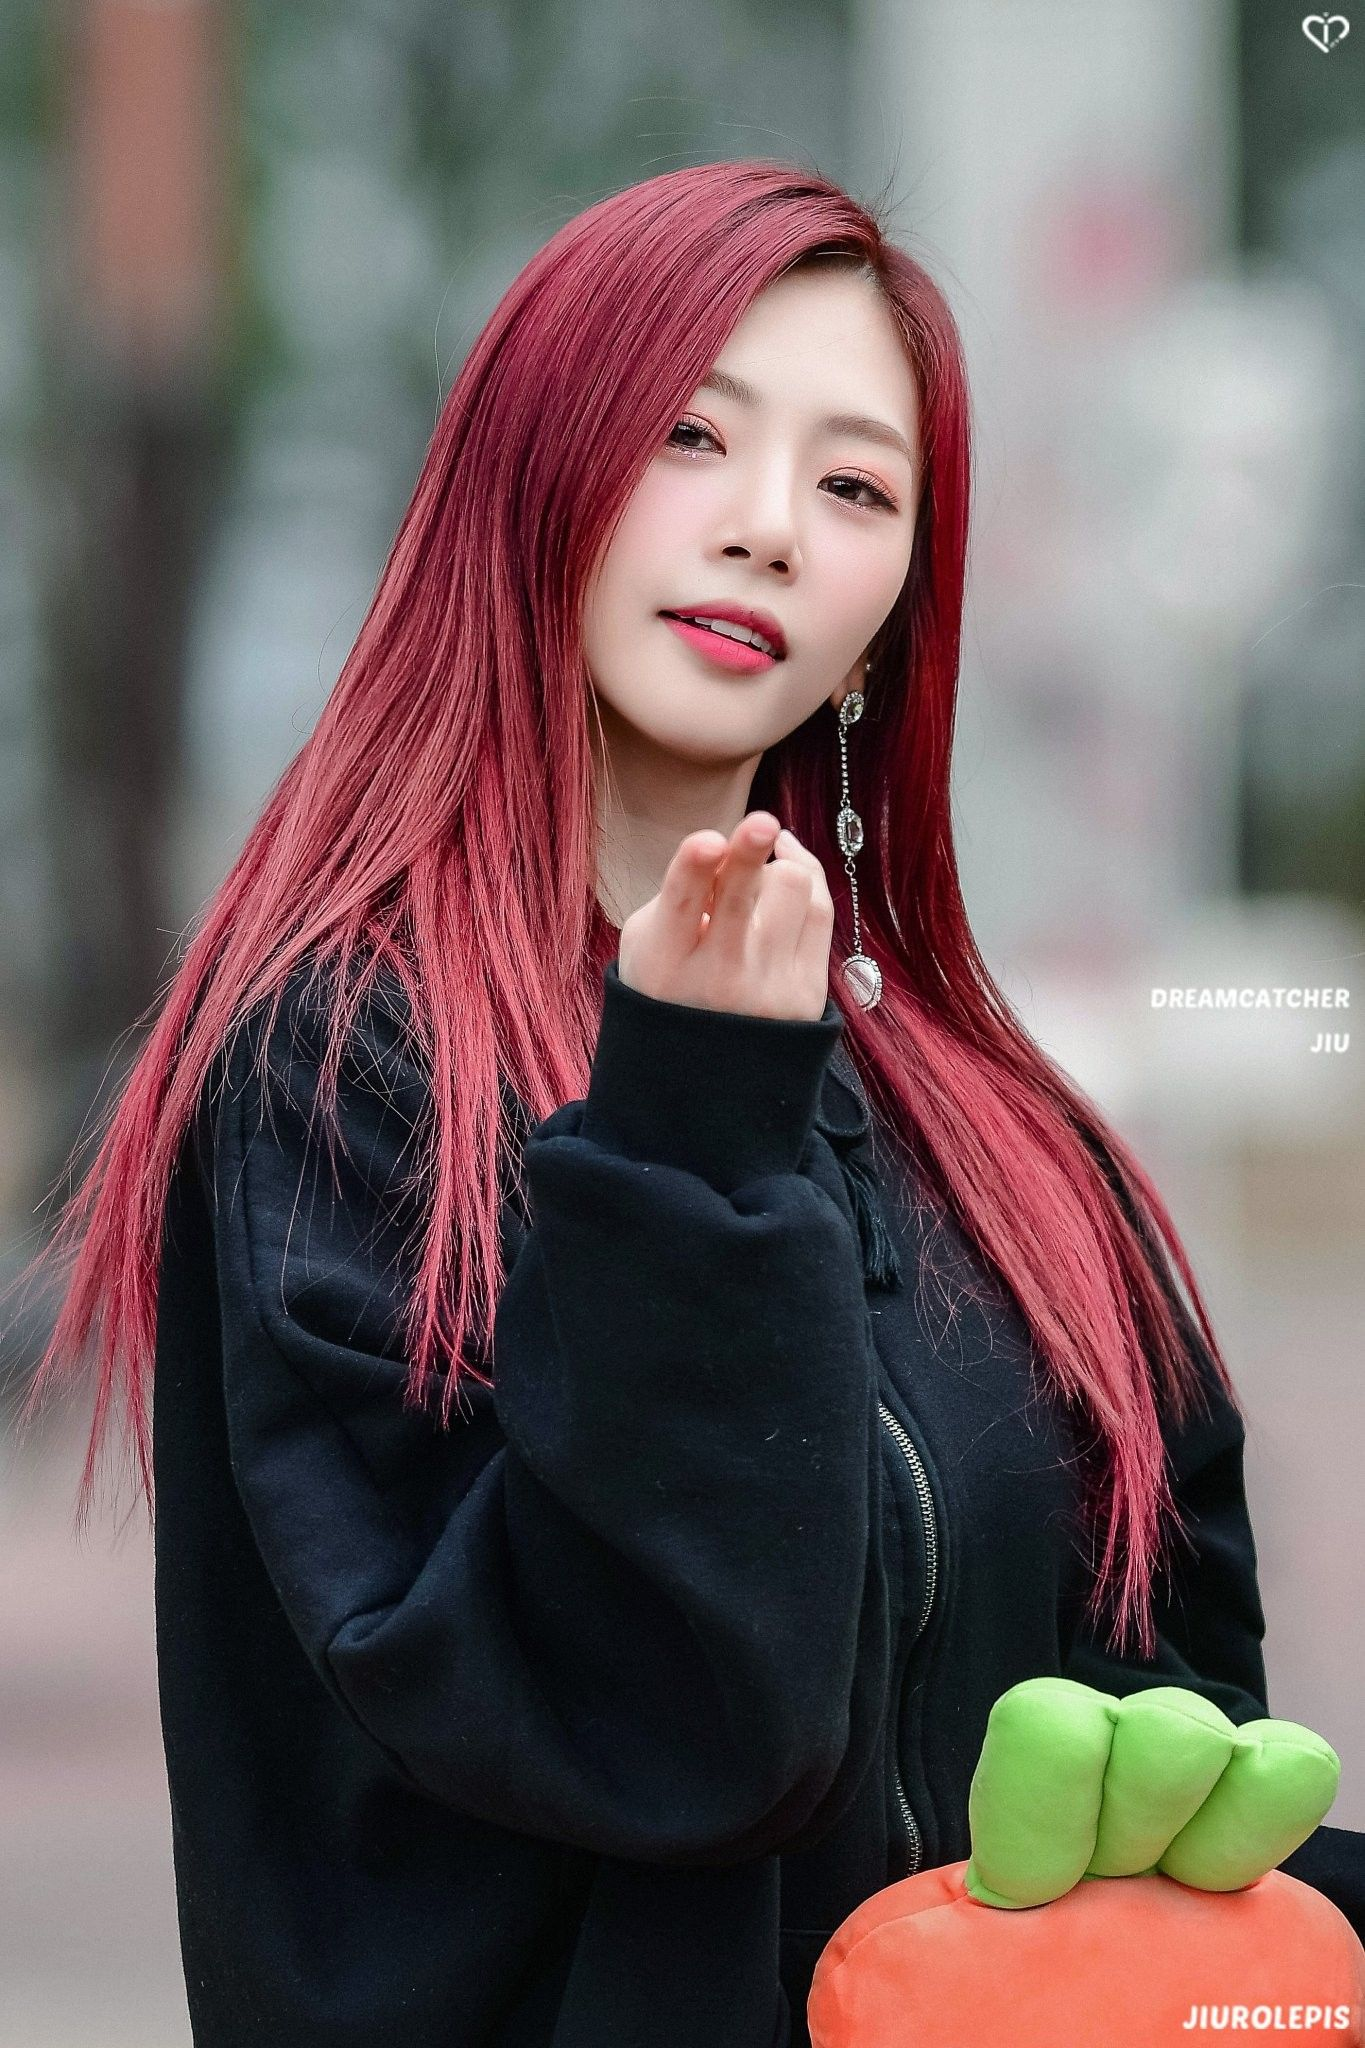 Pin Oleh Pyeongie Di Dreamcatcher Wanita Kim